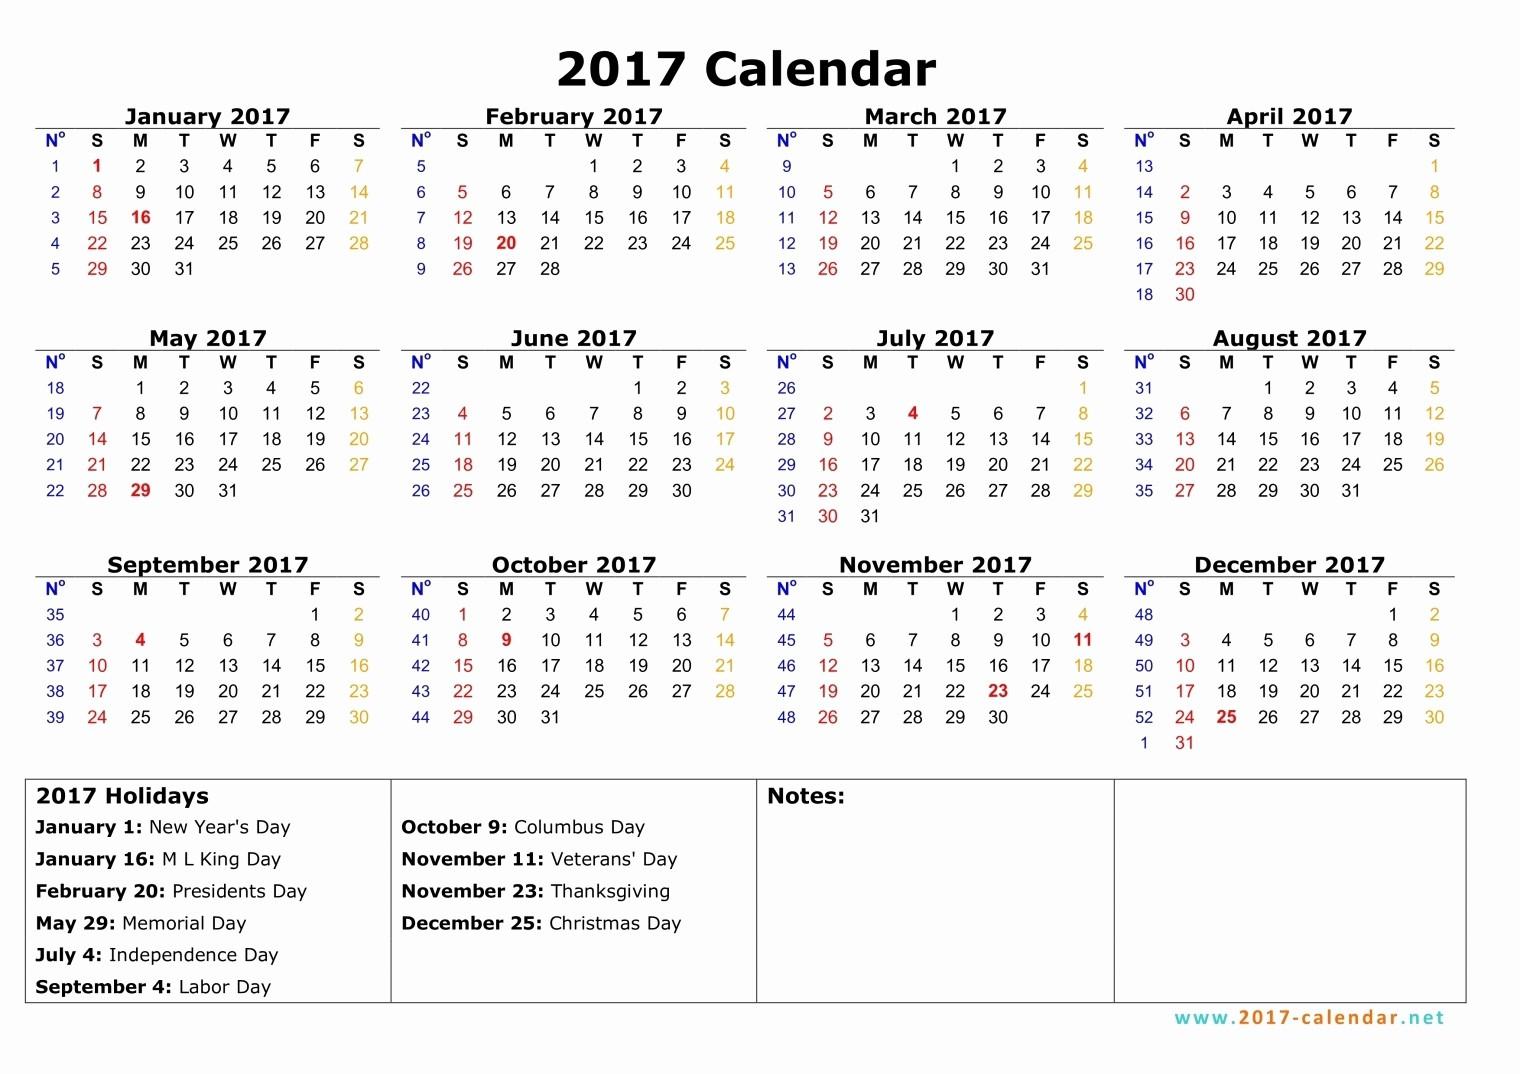 Calendar 2016 Printable with Holidays Luxury Free Printable 2016 Calendar with Holidays